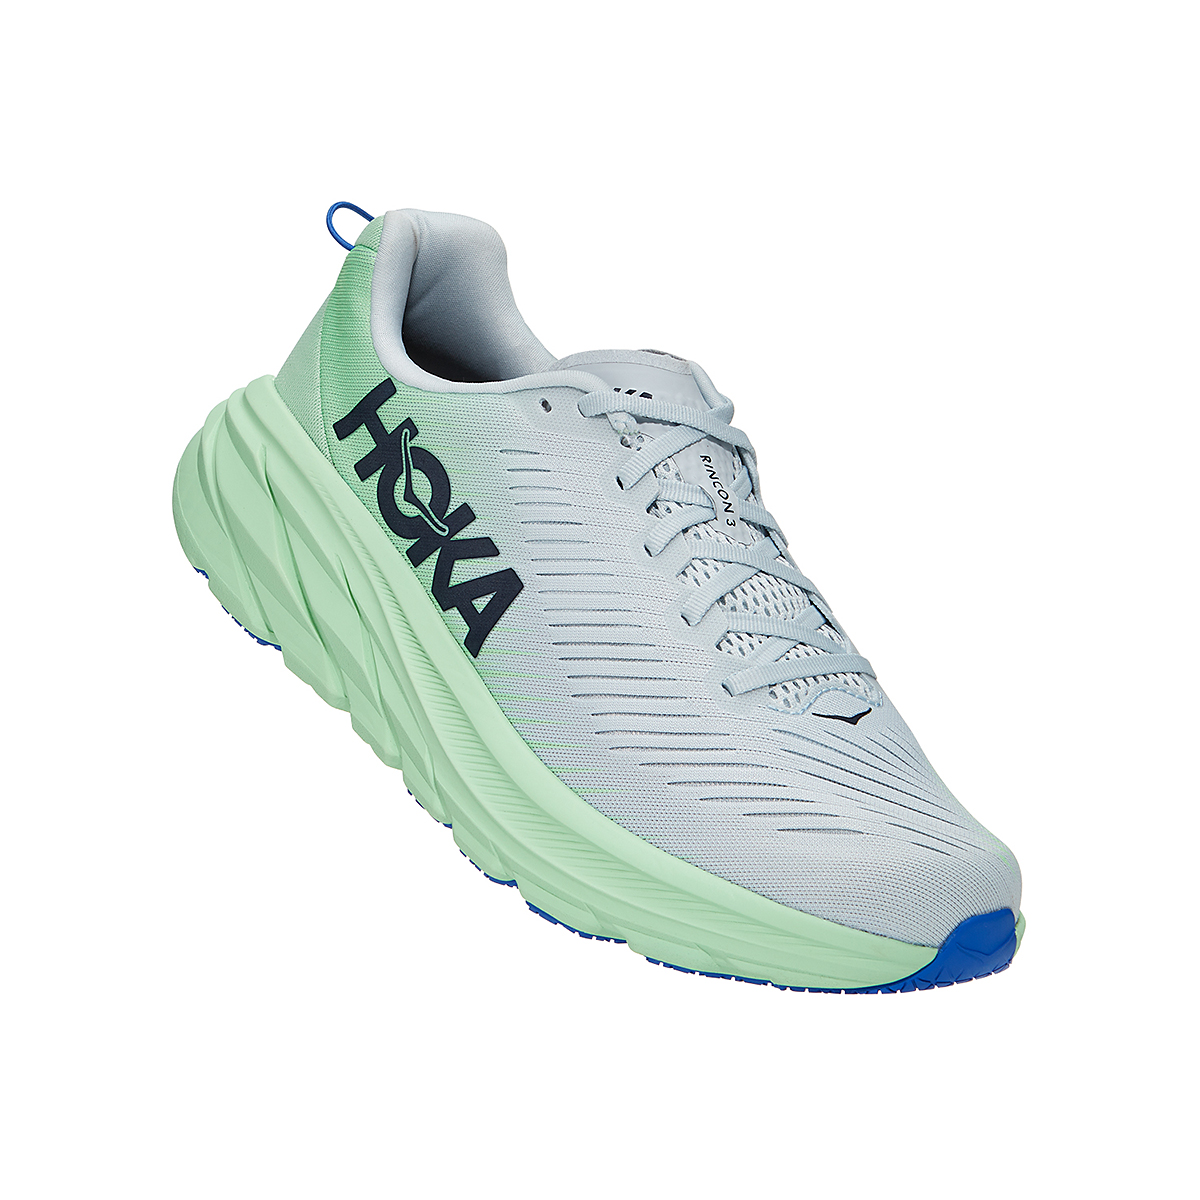 Men's Hoka One One Rincon 3 Running Shoe - Color: Plein Air/Green Ash - Size: 7 - Width: Regular, Plein Air/Green Ash, large, image 2